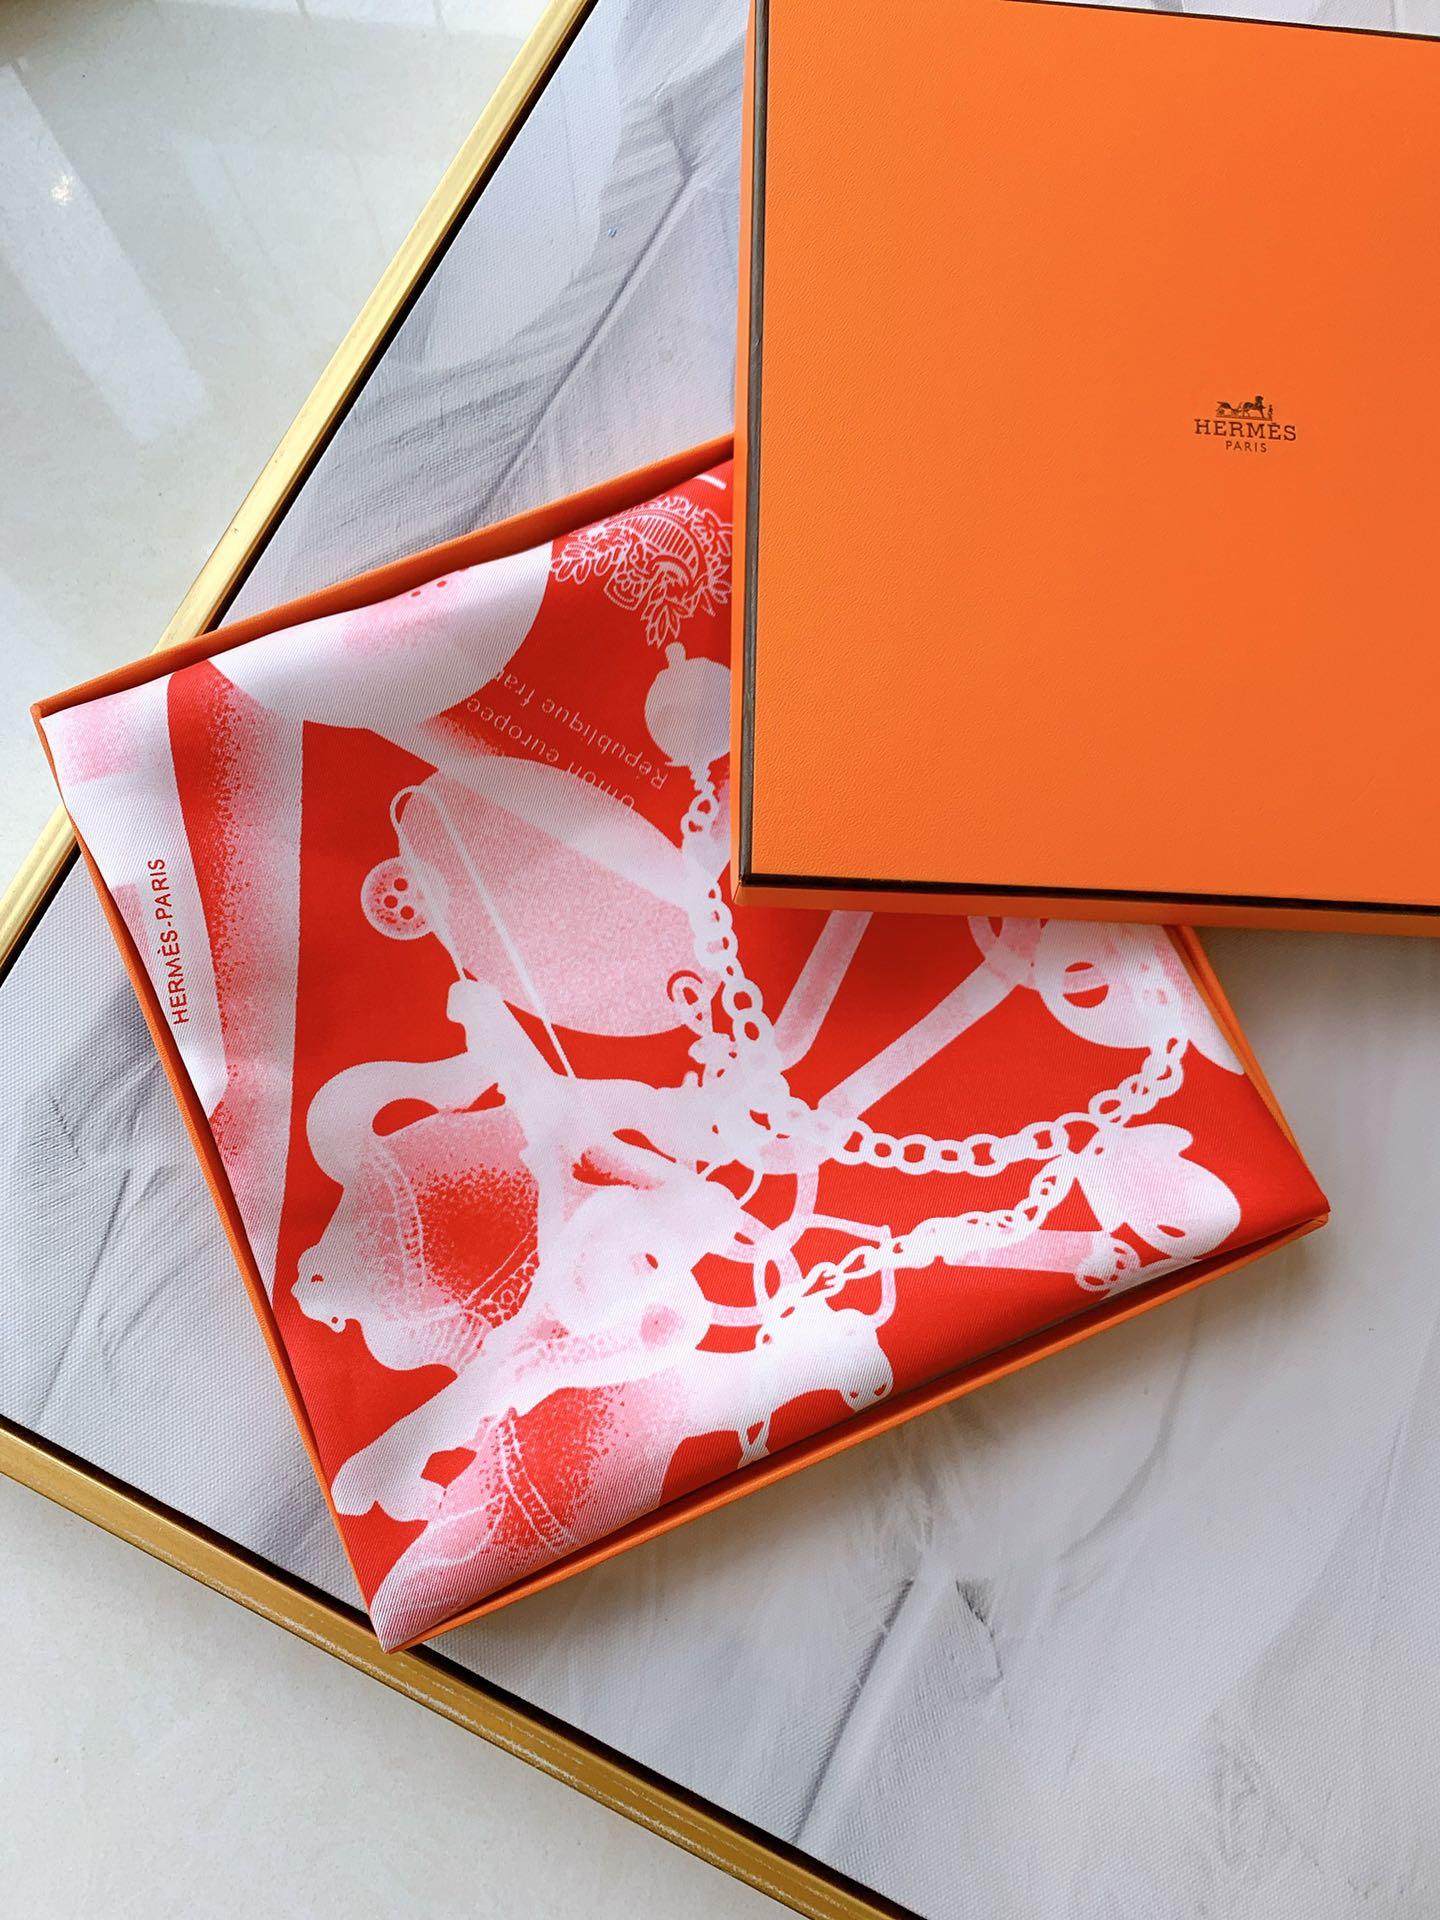 HEREMS《CheckIn》橙色 90×90cm100%真丝斜纹绸18mm大克重